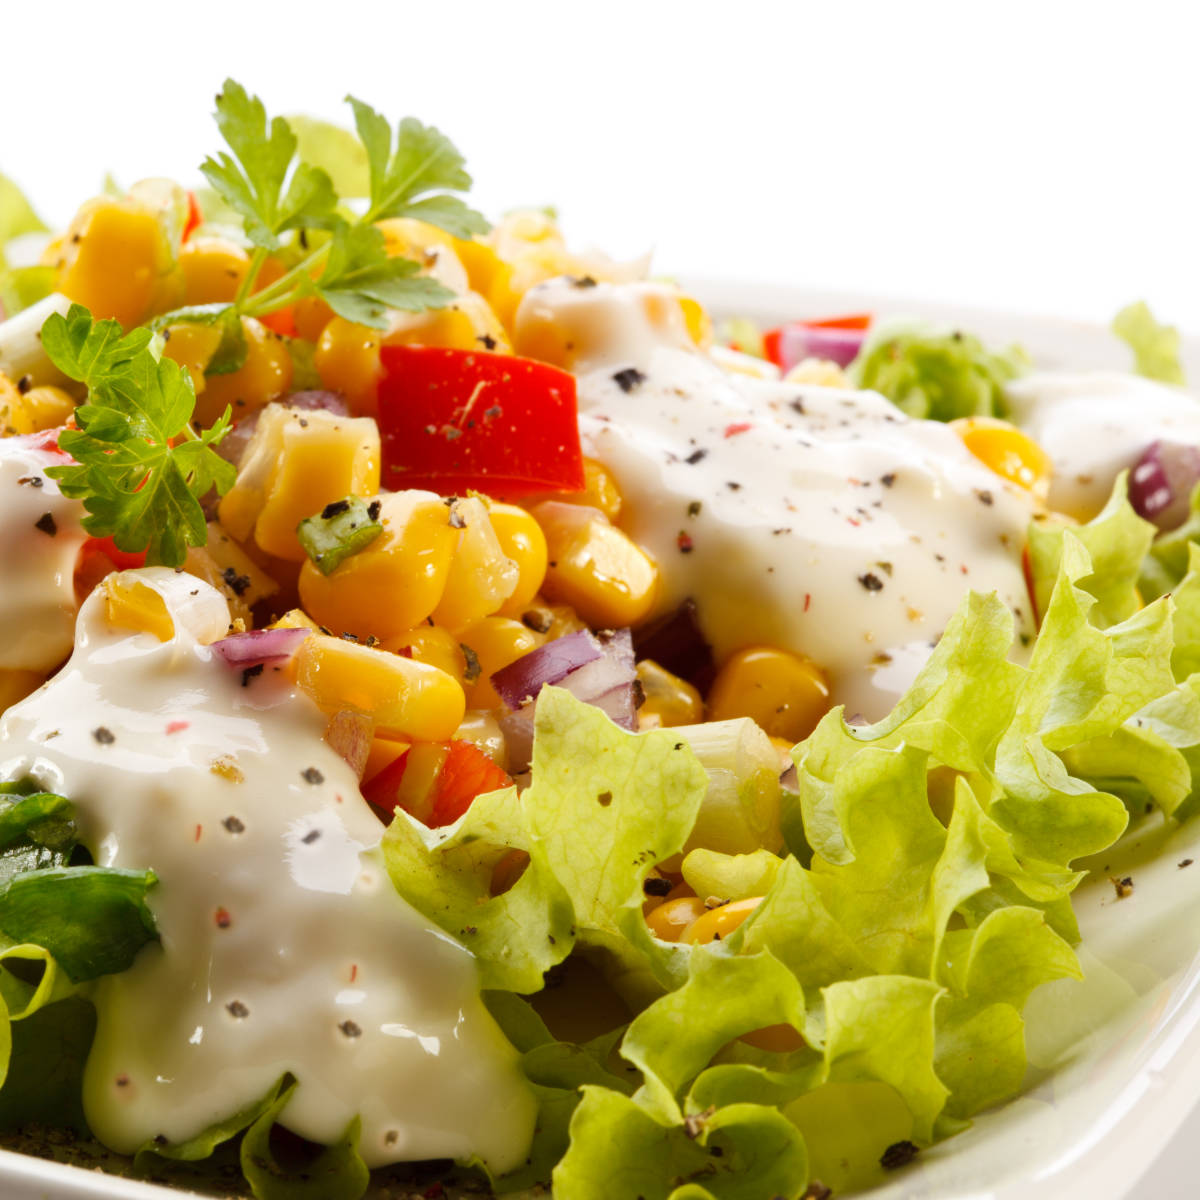 salatdressing-joghurt